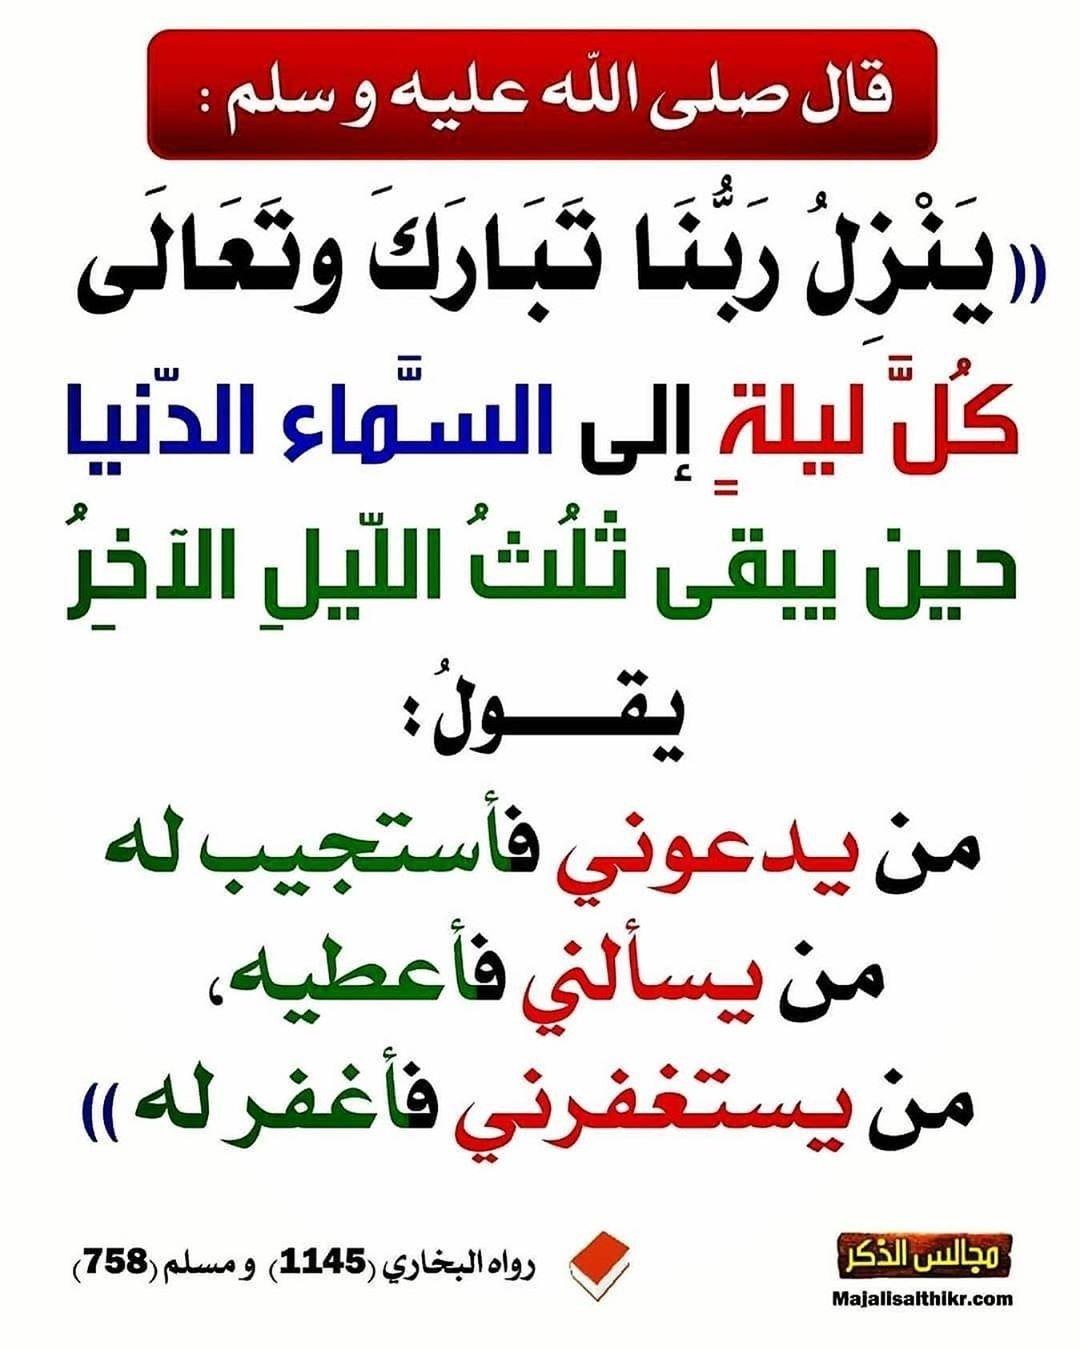 Pin By عبق الورد On أحاديث نبوية ١ Islam Facts Quran Verses Ahadith